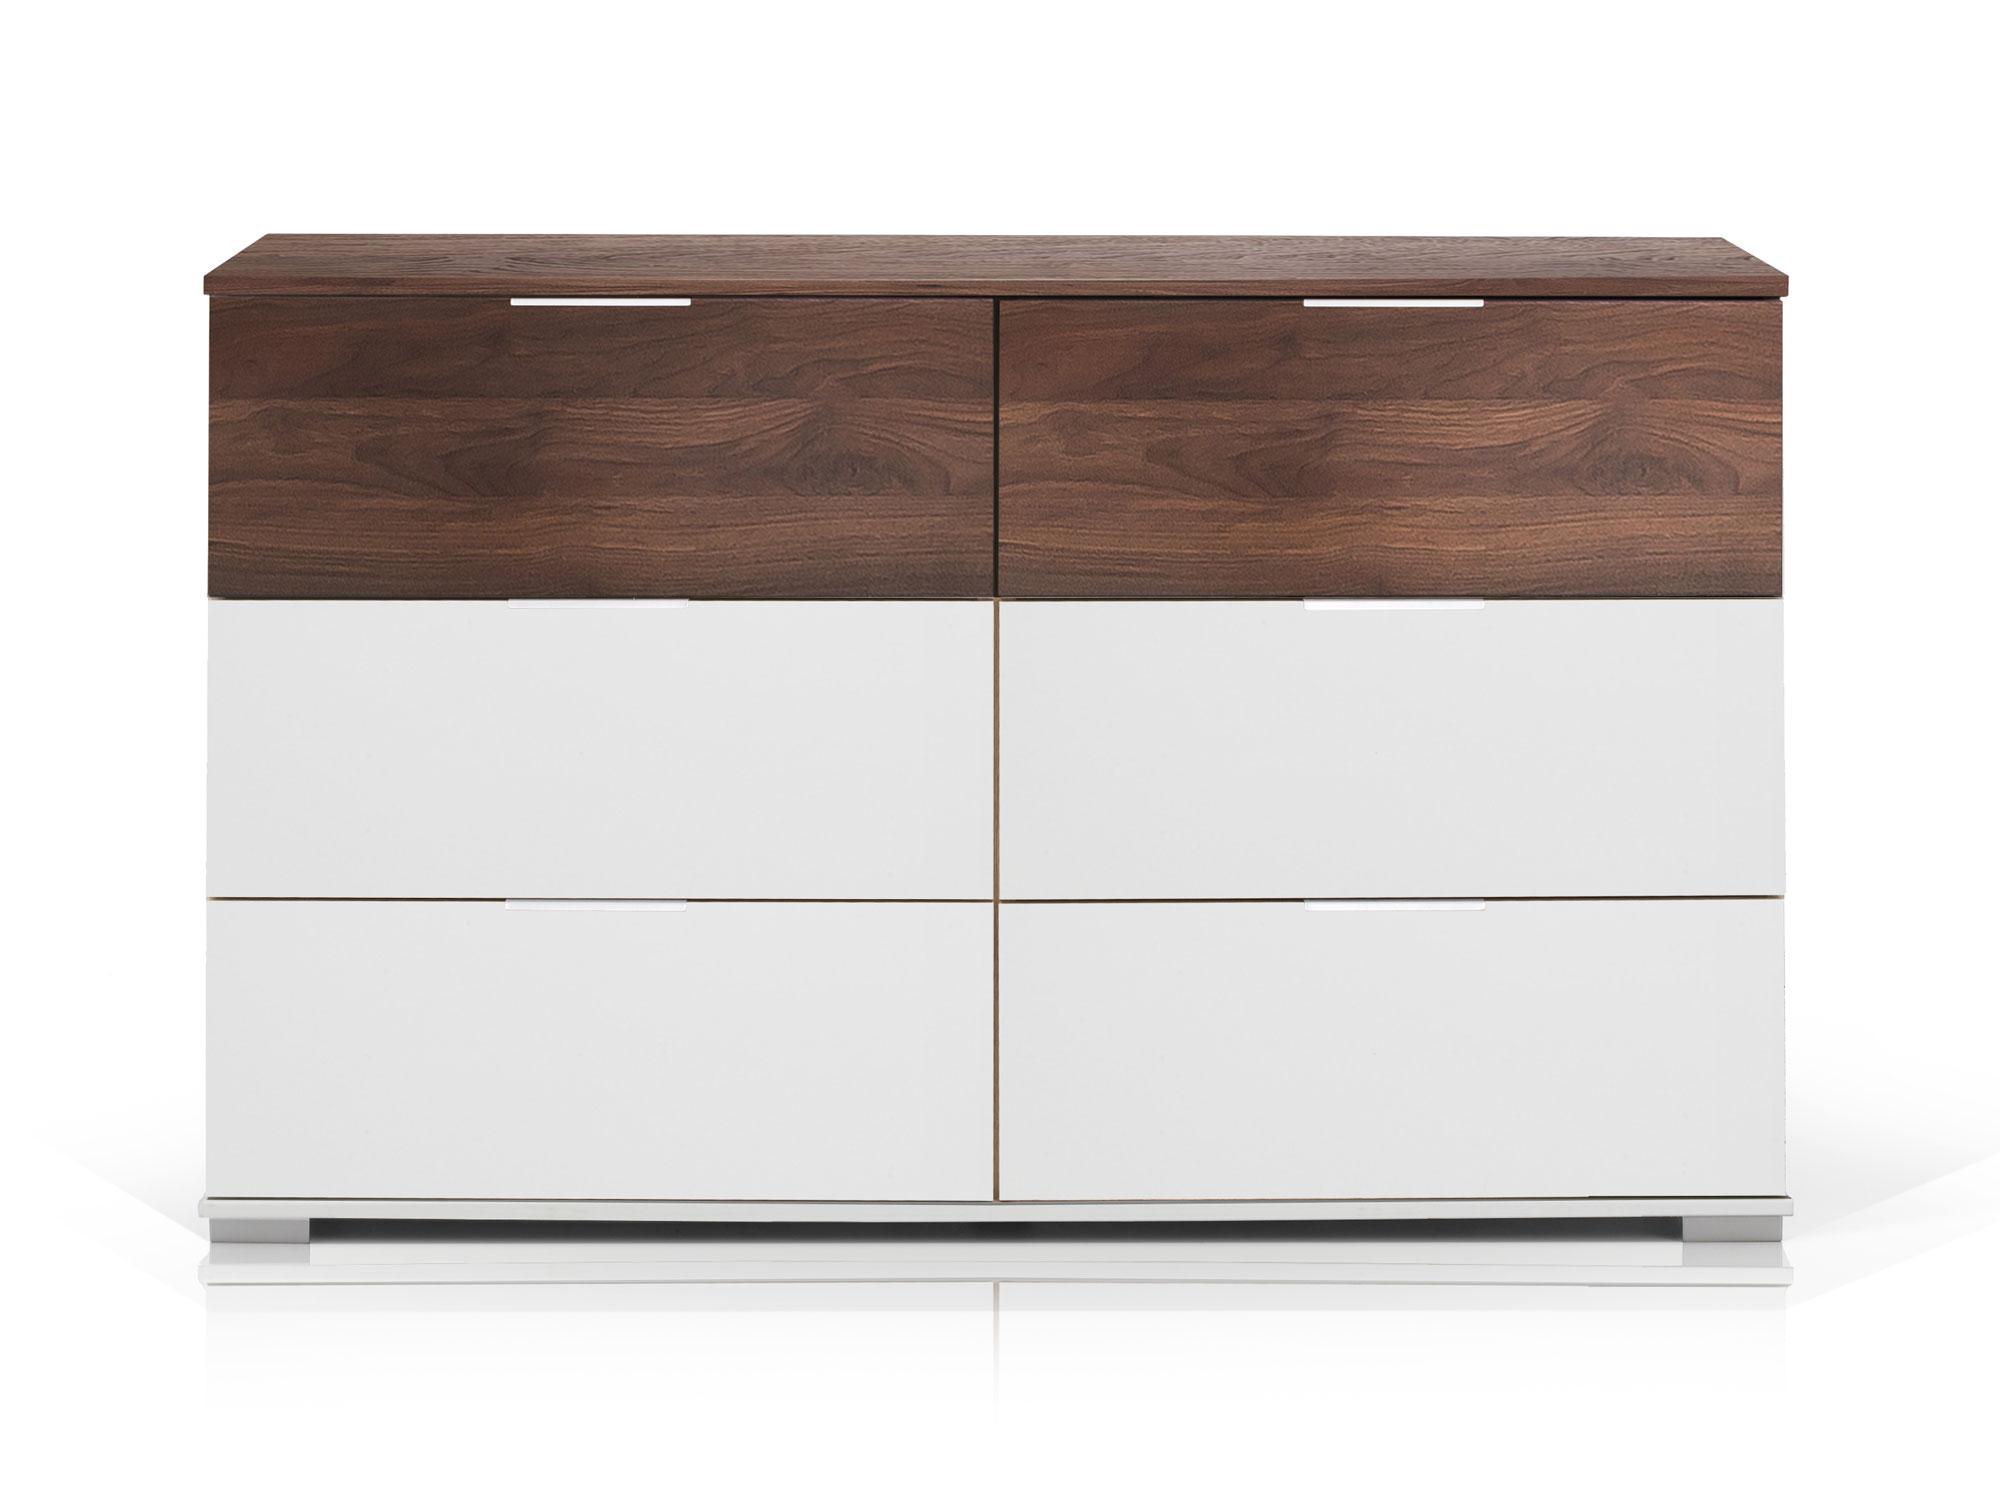 famous schubkastenkommode kommode sideboard 6 schubk sten. Black Bedroom Furniture Sets. Home Design Ideas